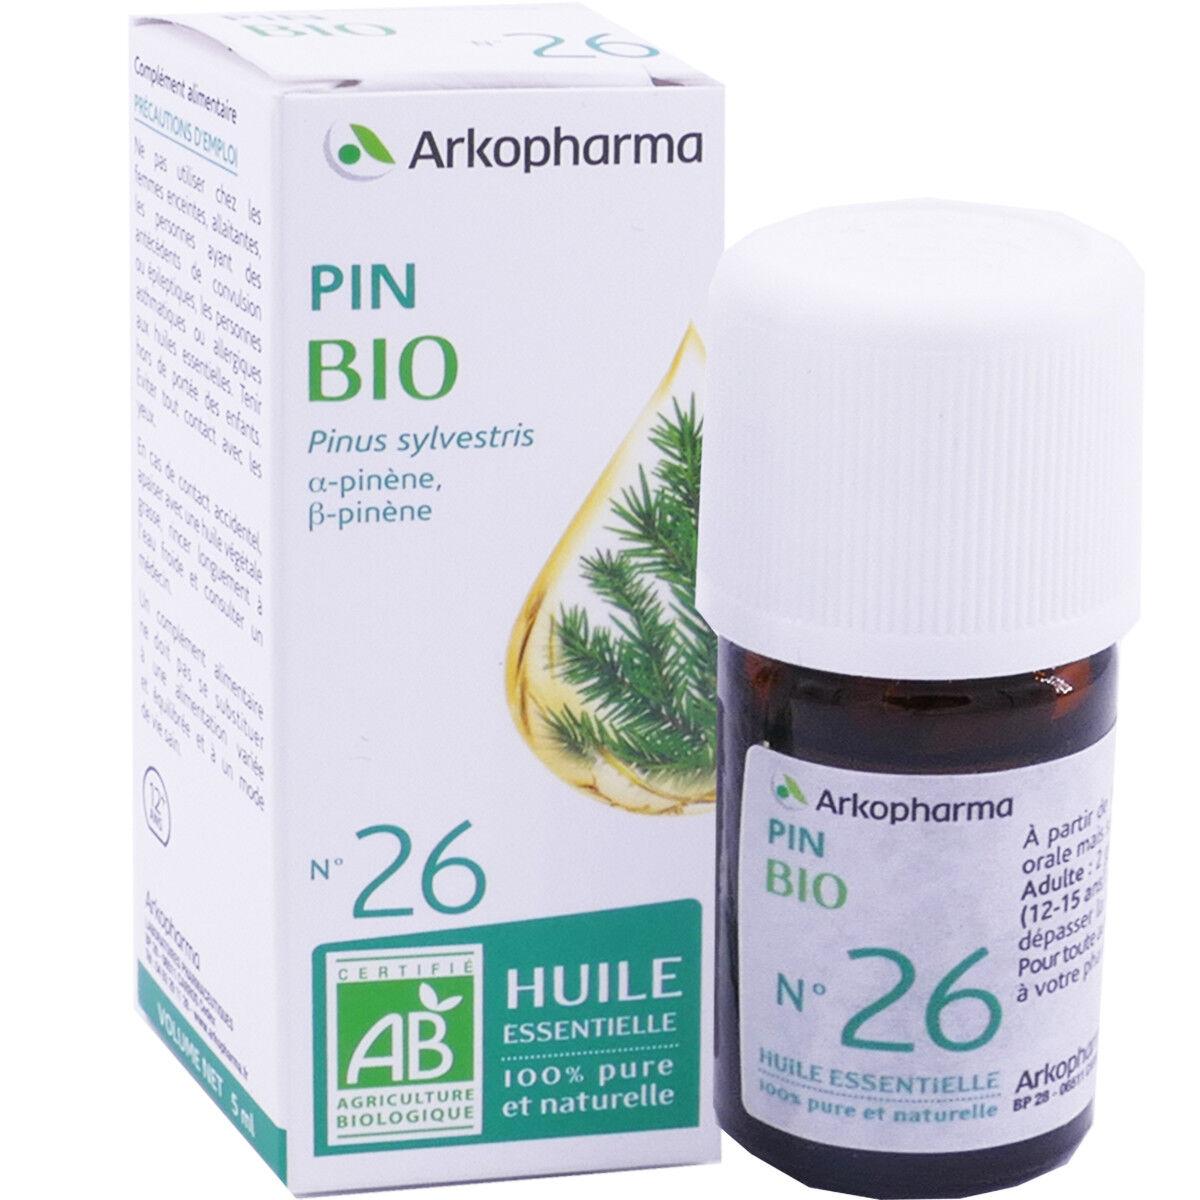 Arkopharma huile essentielle pin bio n°26 5 ml